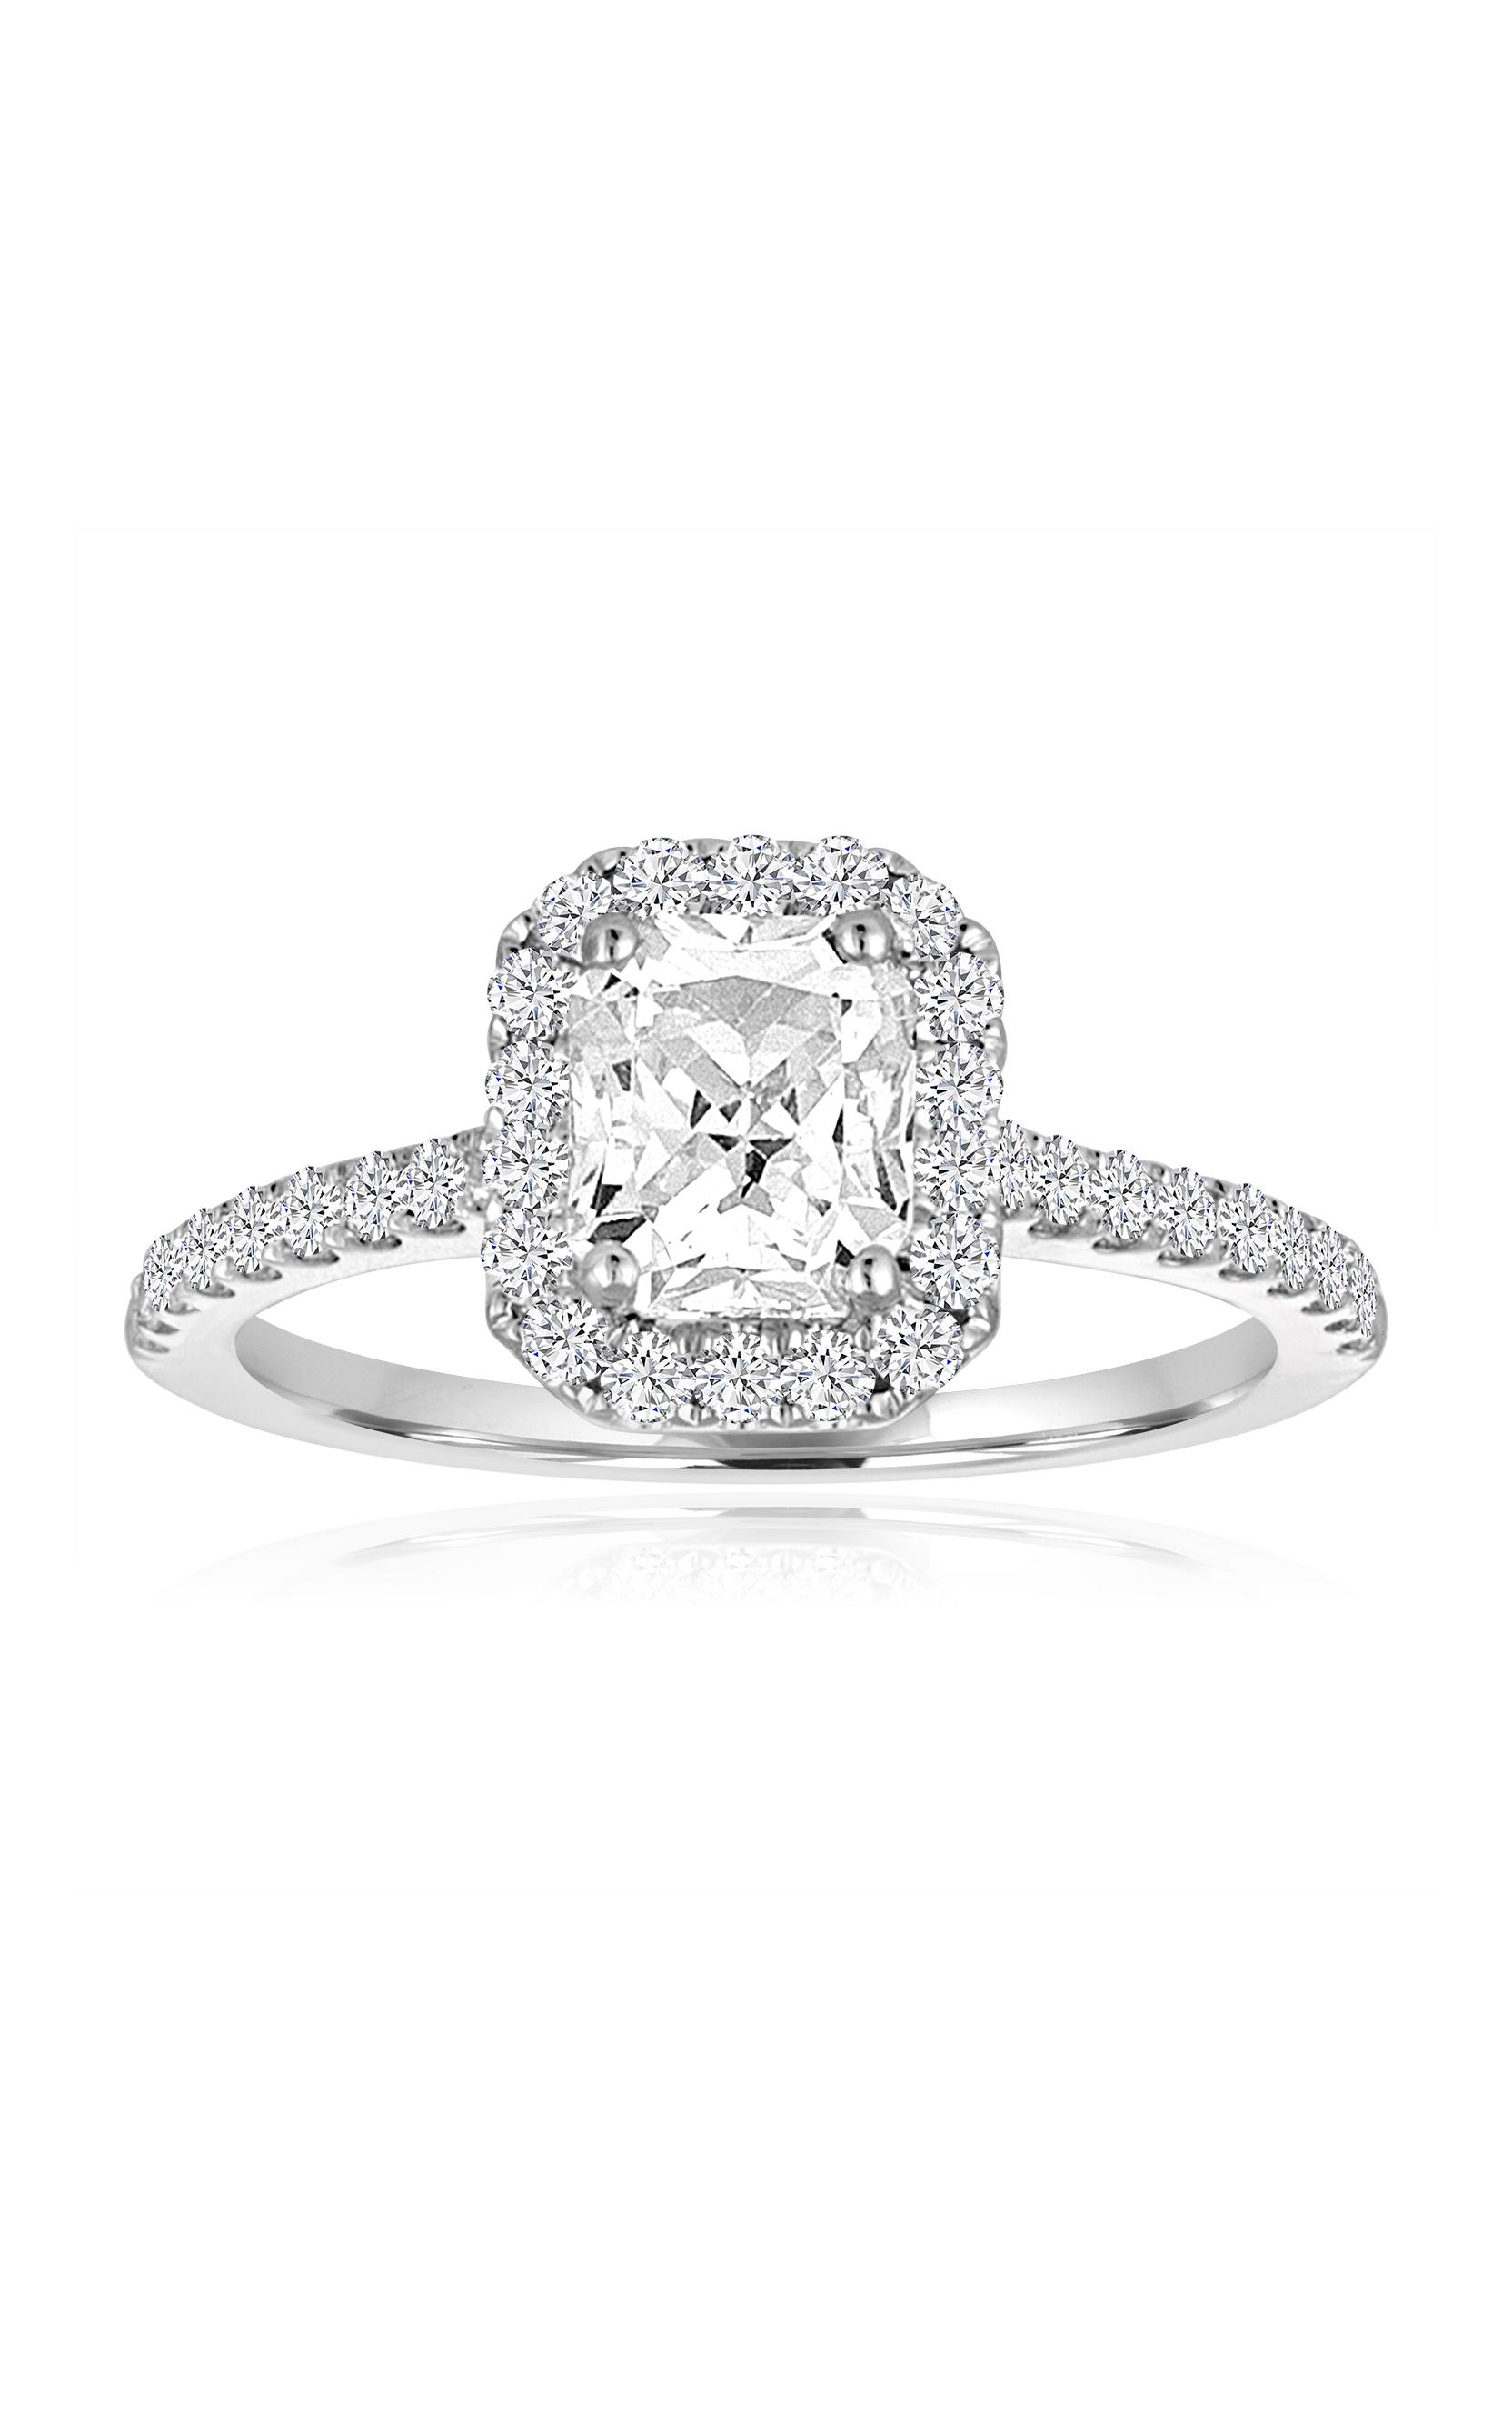 Imagine Bridal Engagement Rings 60236D-3 8 product image